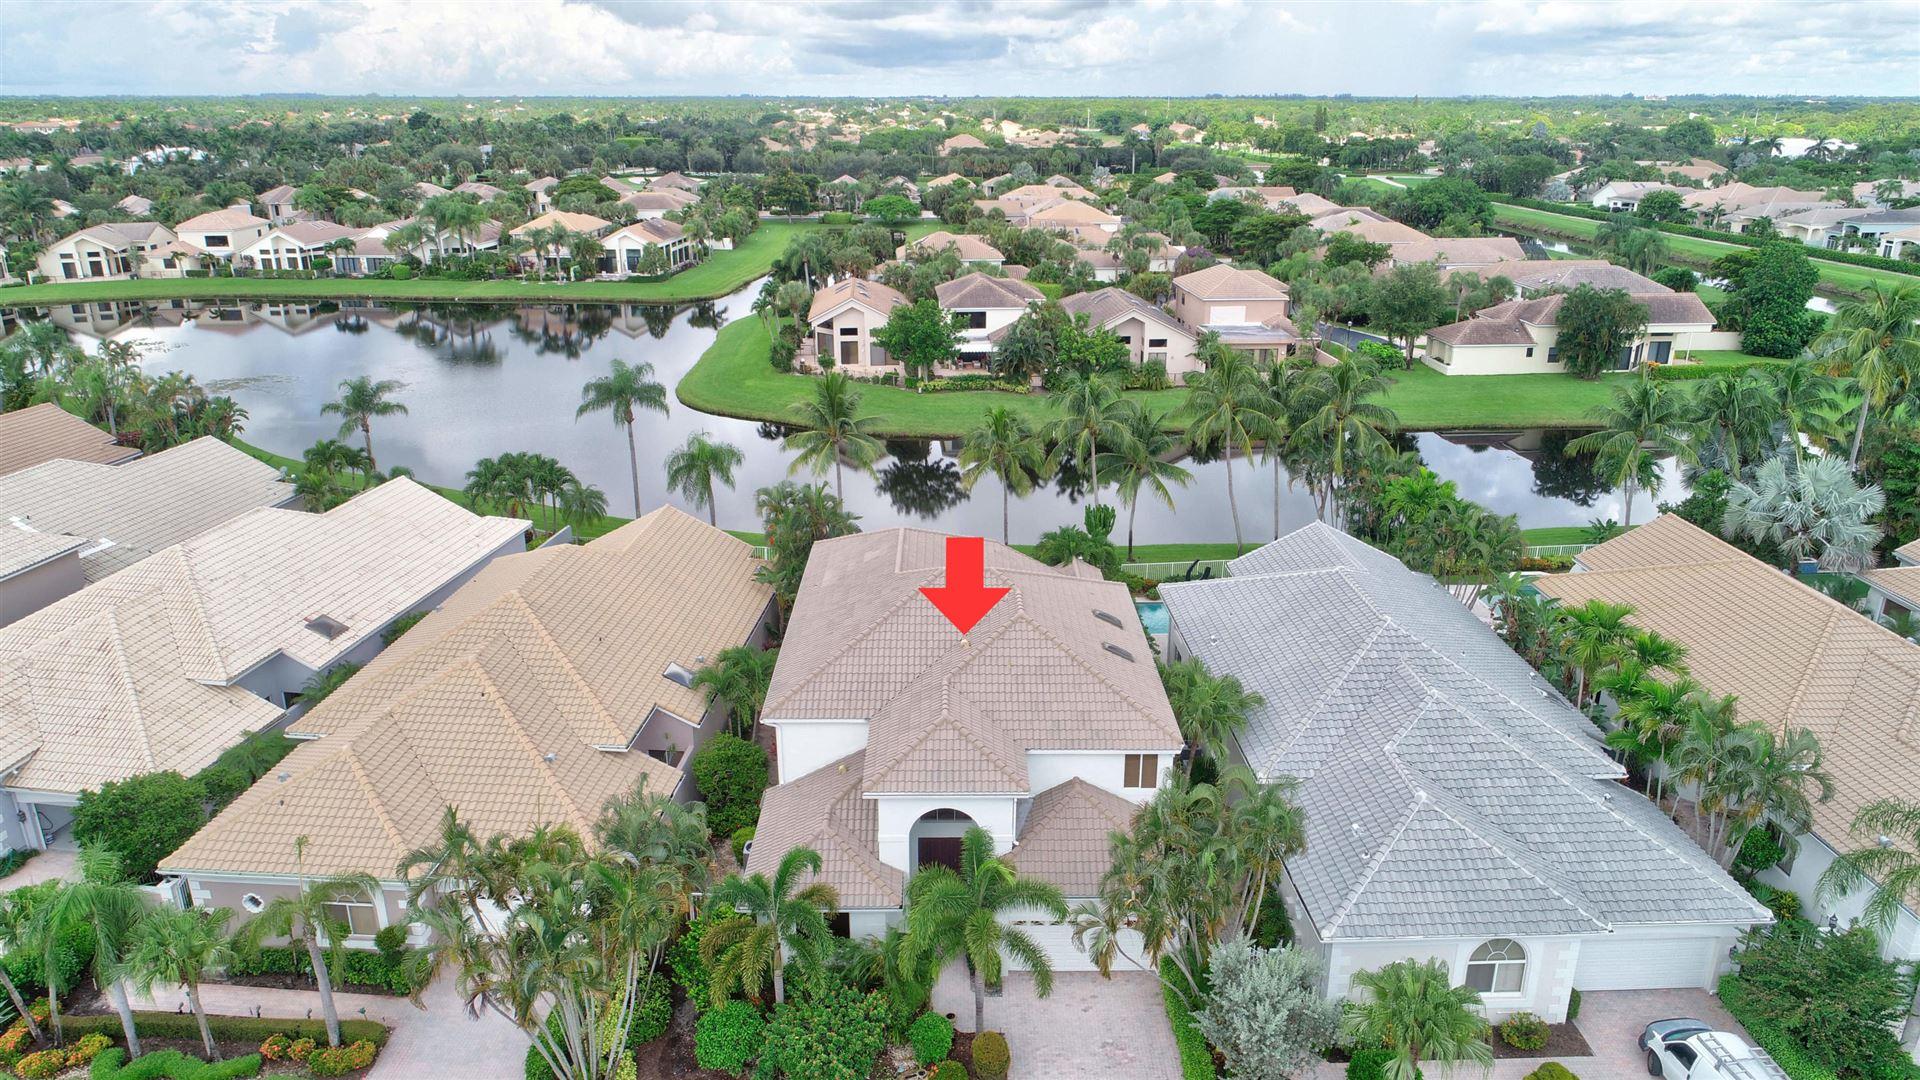 17061 Grand Bay Drive, Boca Raton, FL 33496 - #: RX-10651859